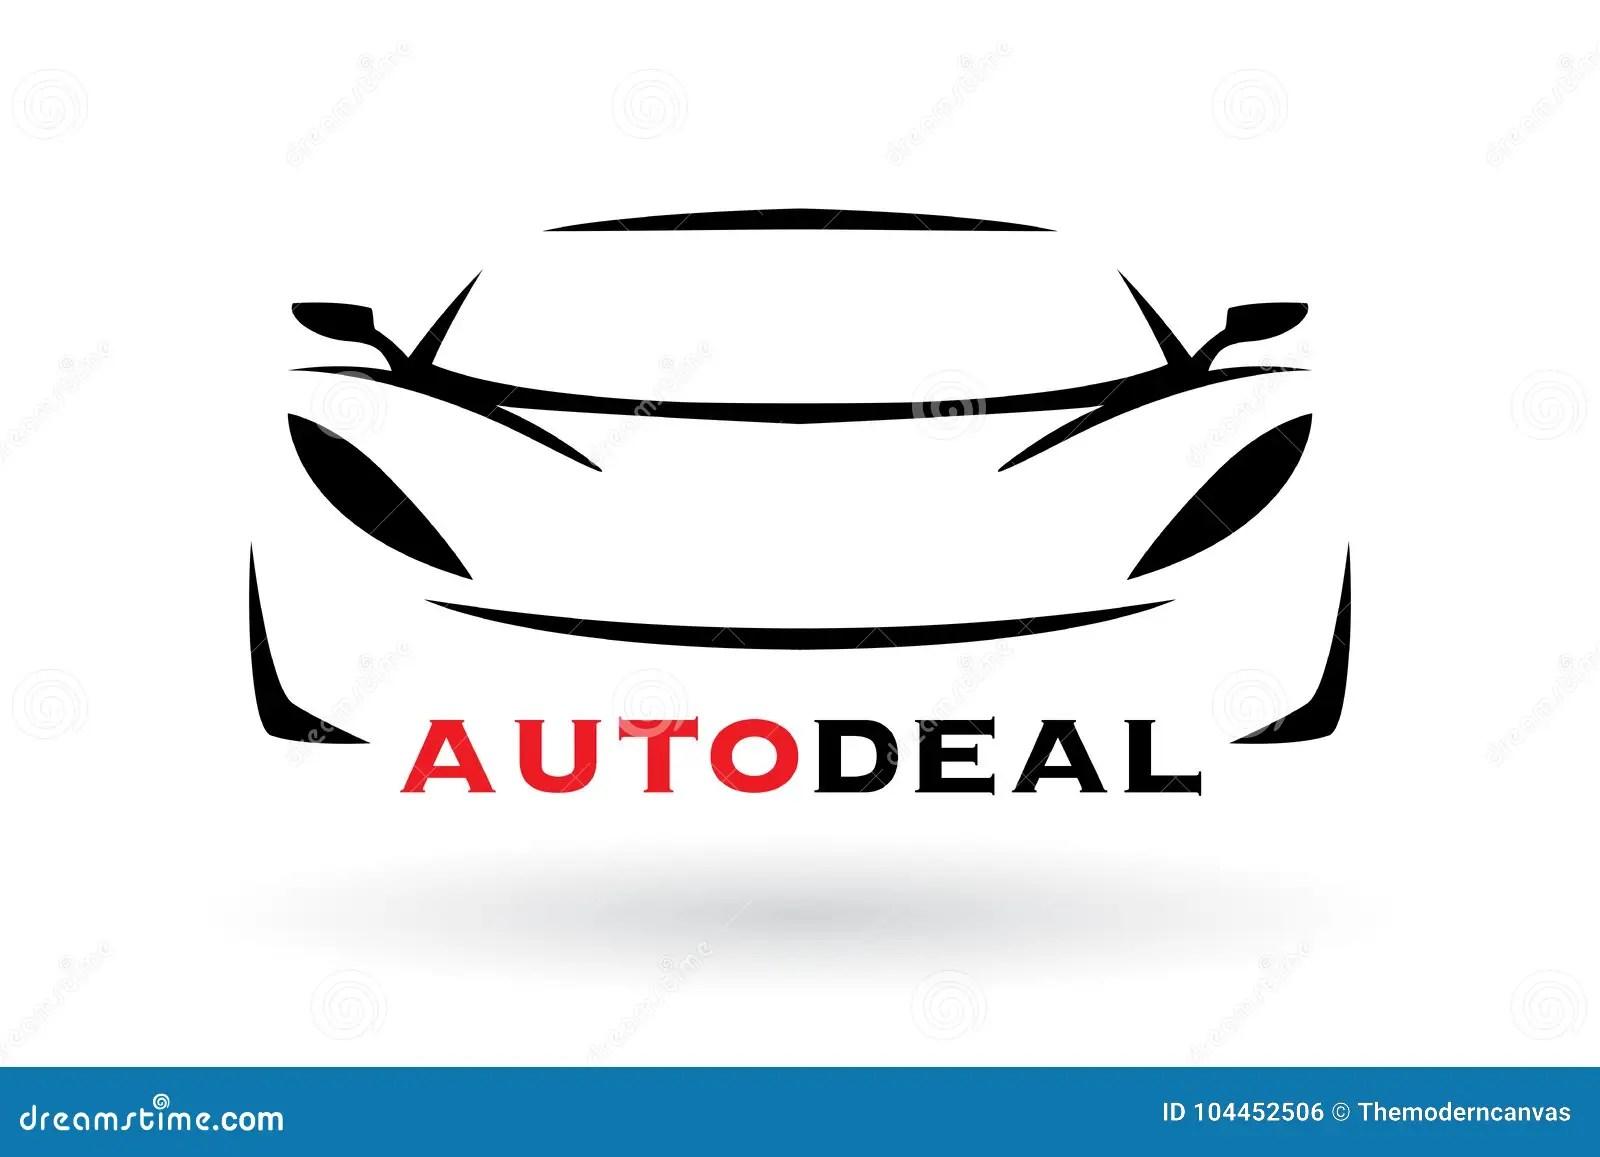 Sports Car Vehicle Silhouette Logo Design Stock Vector